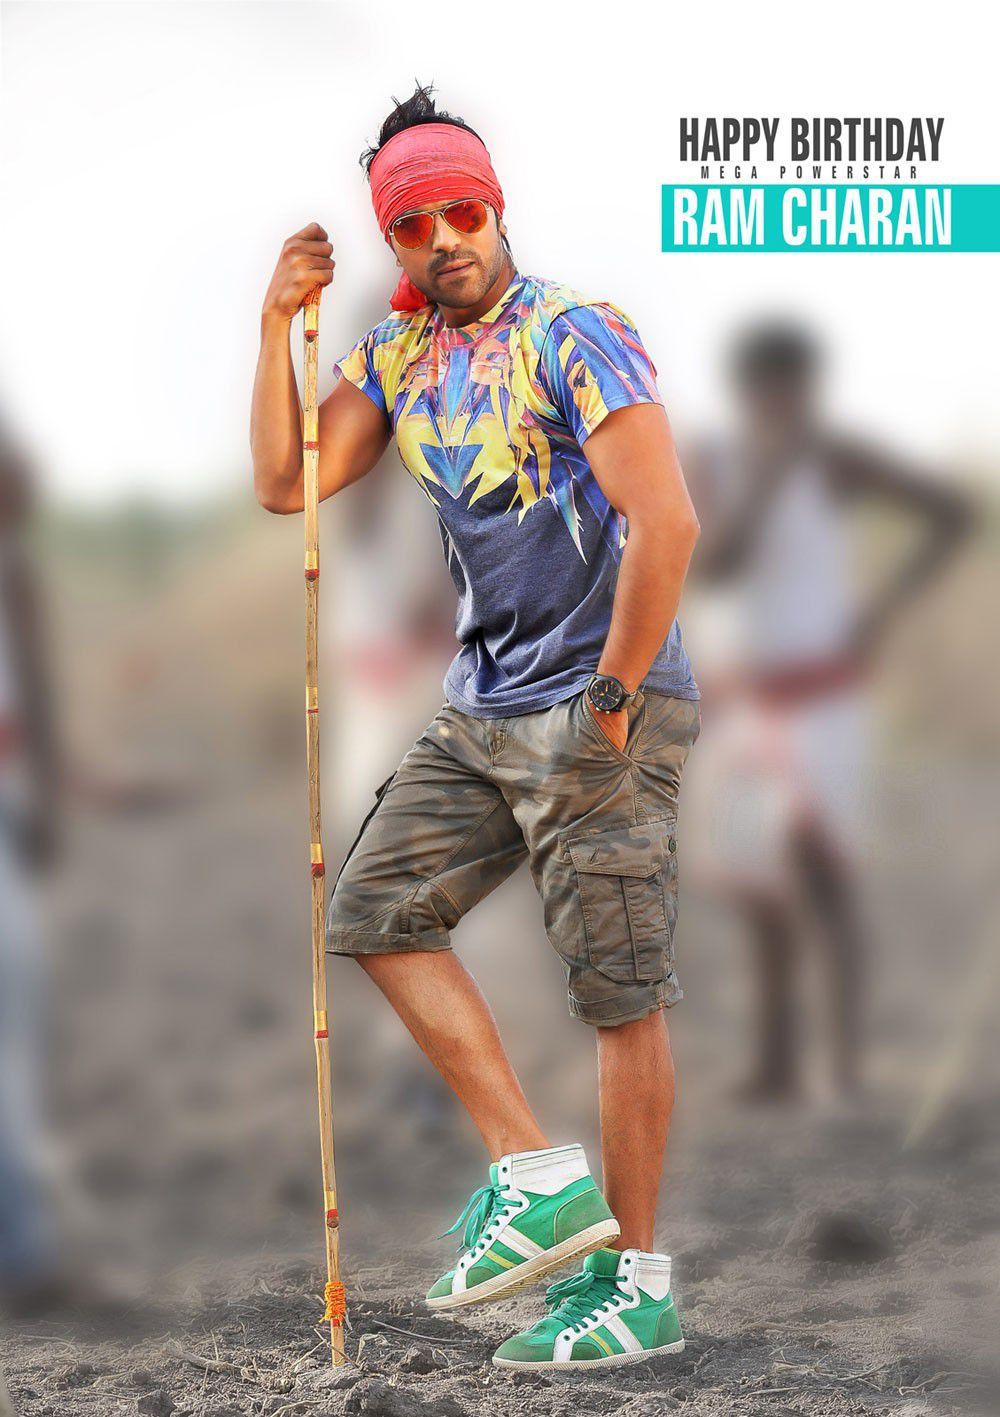 Ram Charan birthday wallpapers